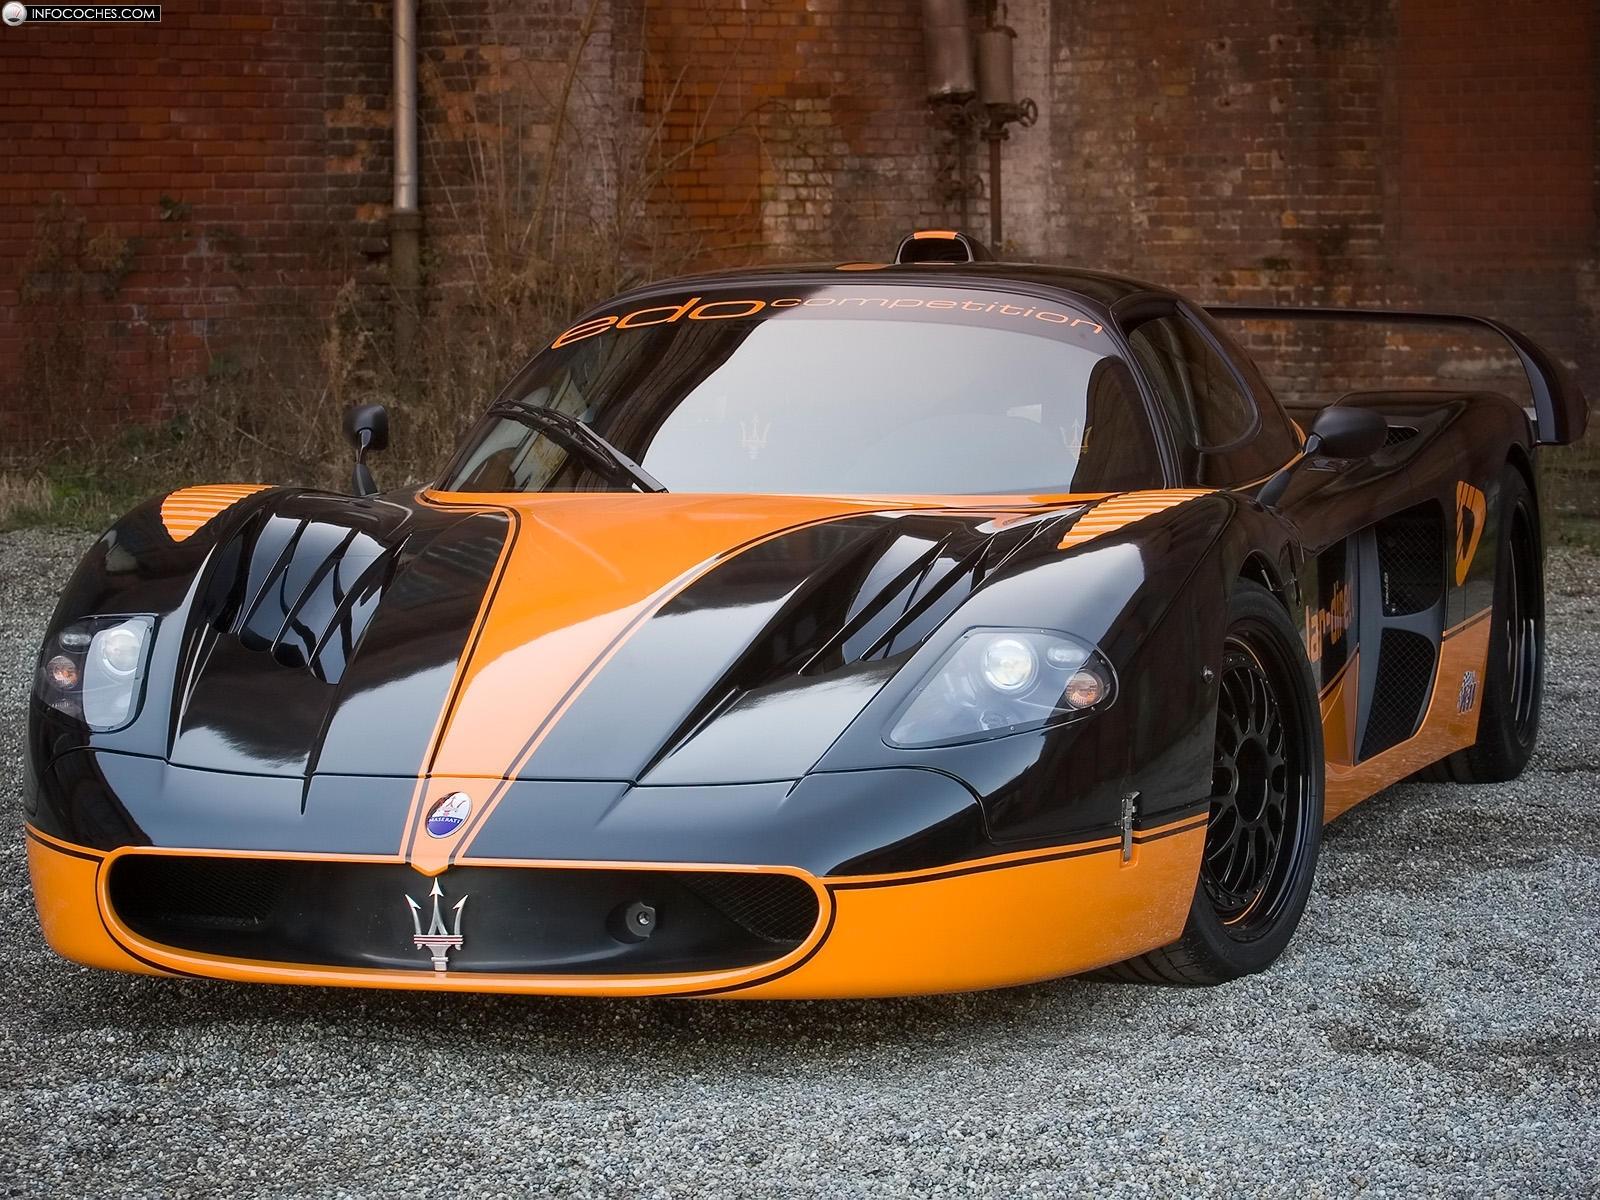 Handy-Wallpaper Transport, Auto, Maserati kostenlos herunterladen.